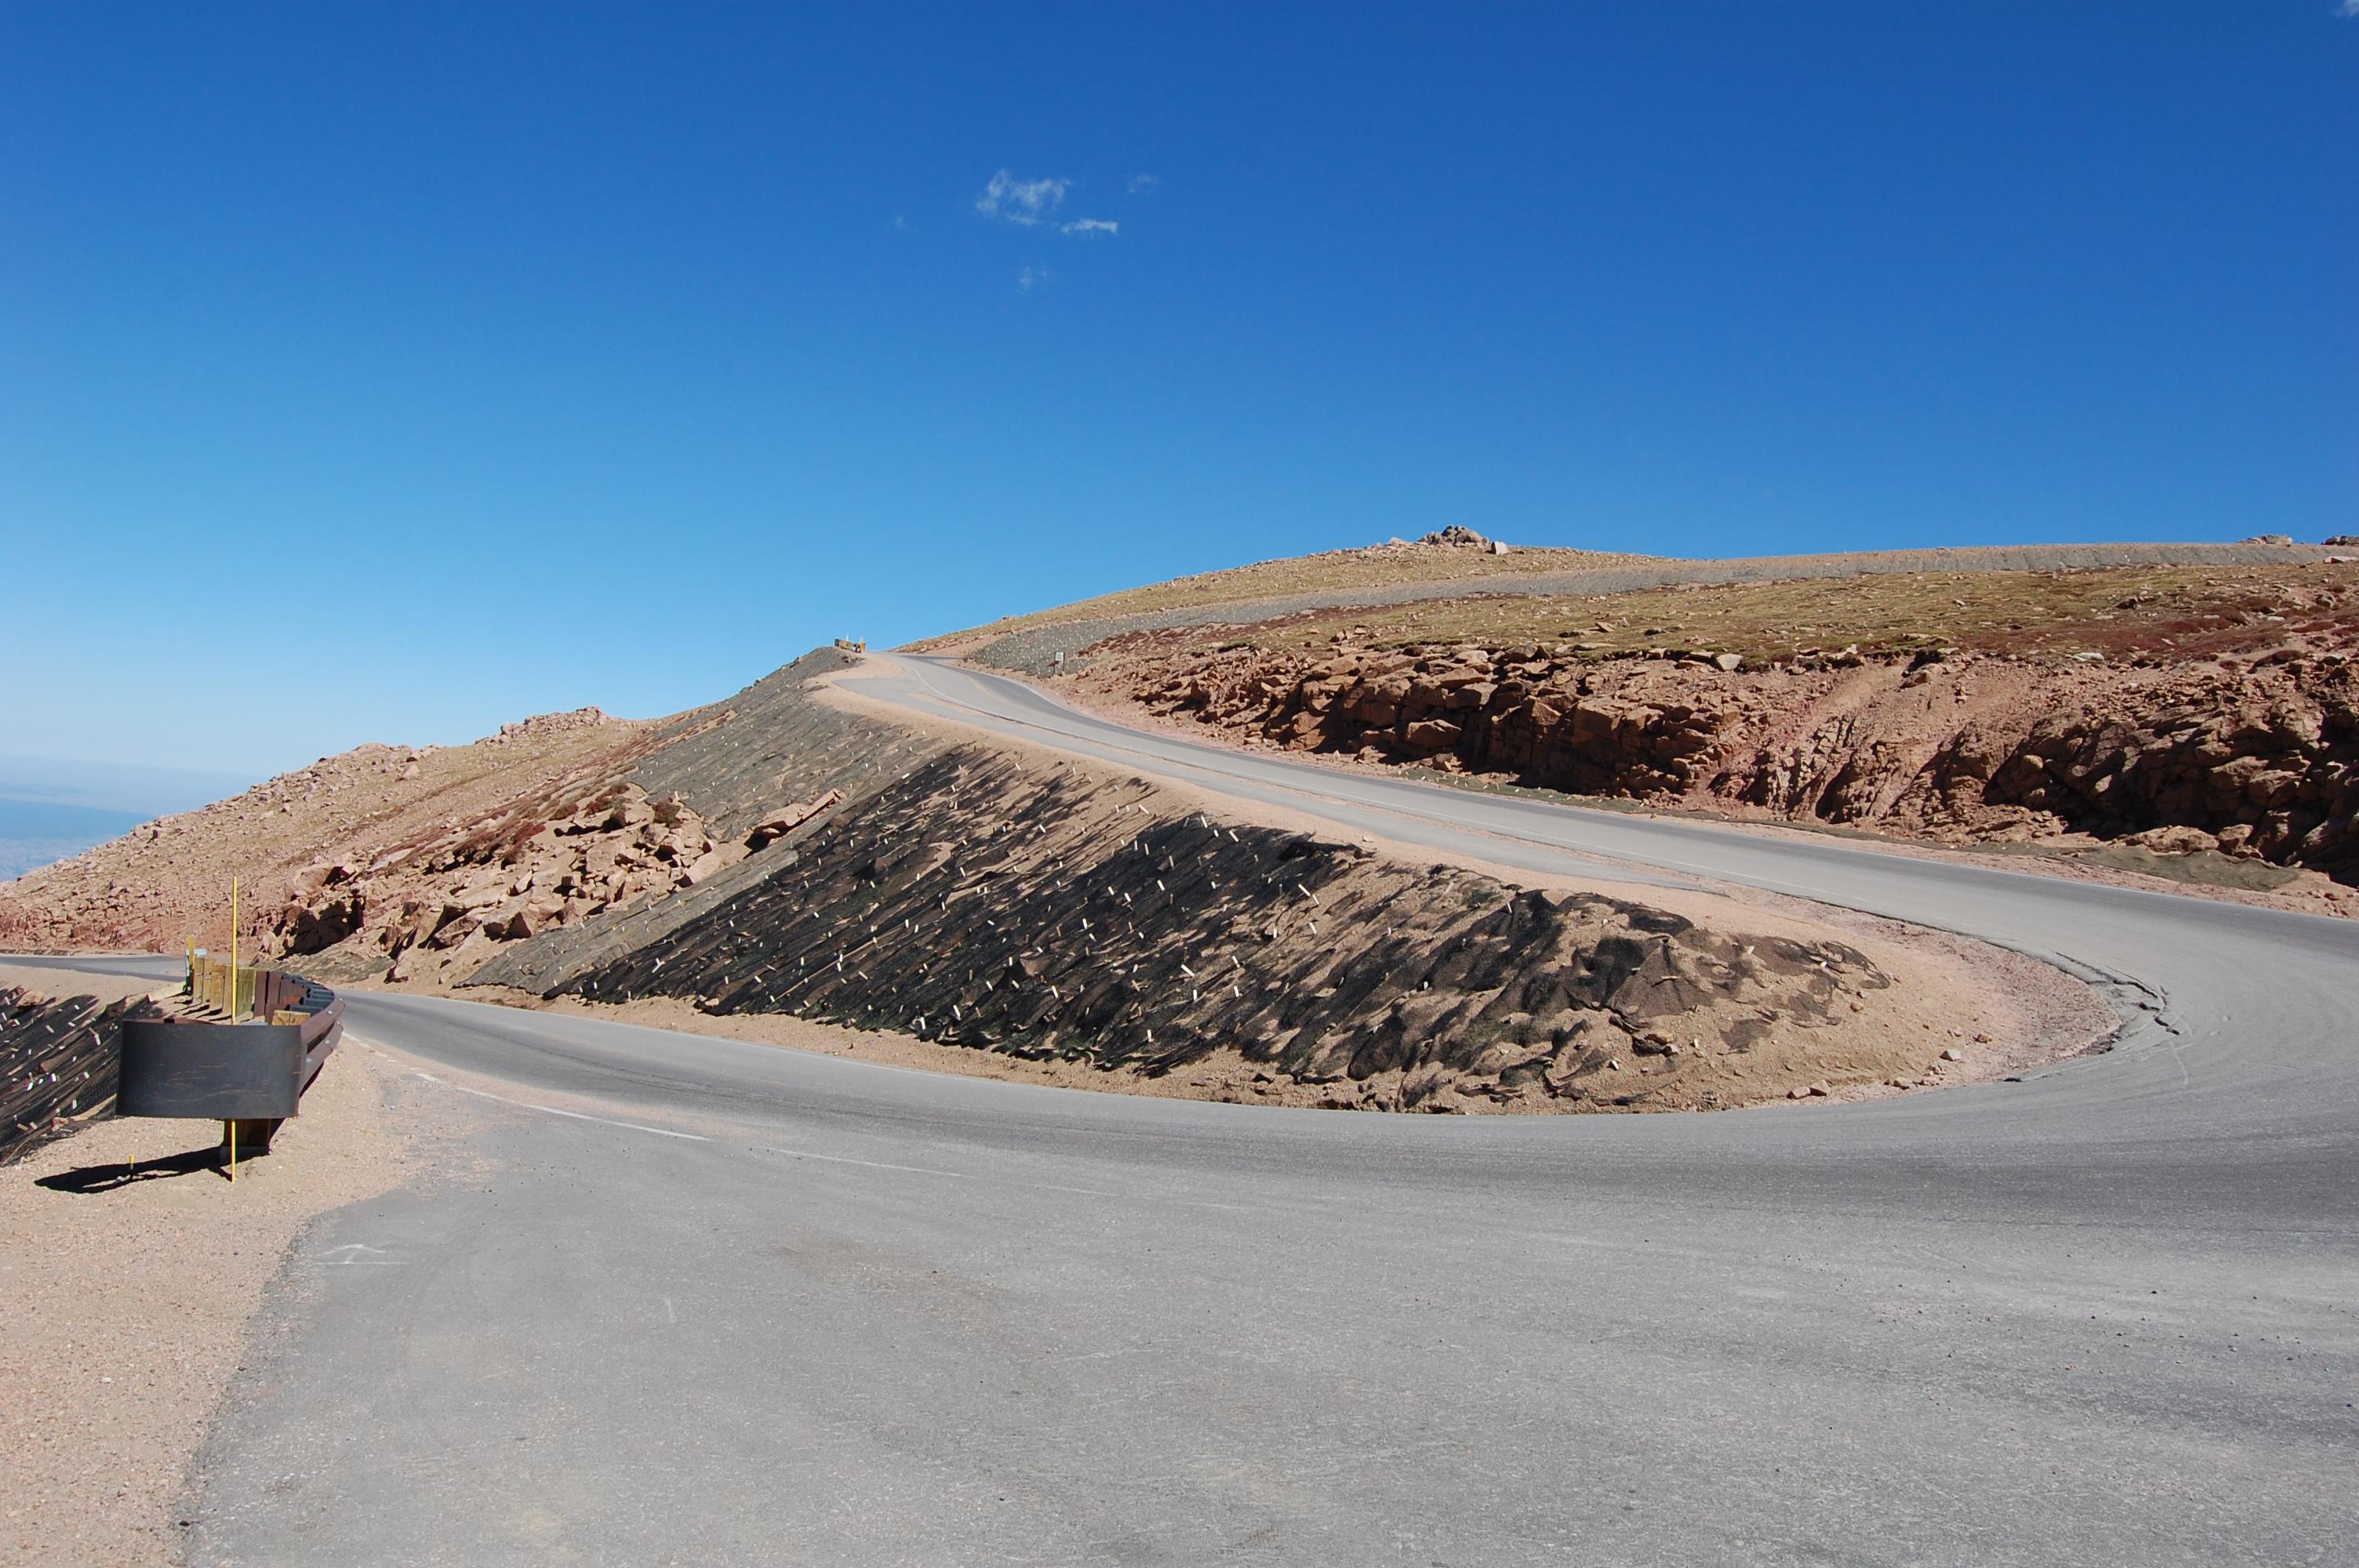 Pikes Peak Highway S-Curve